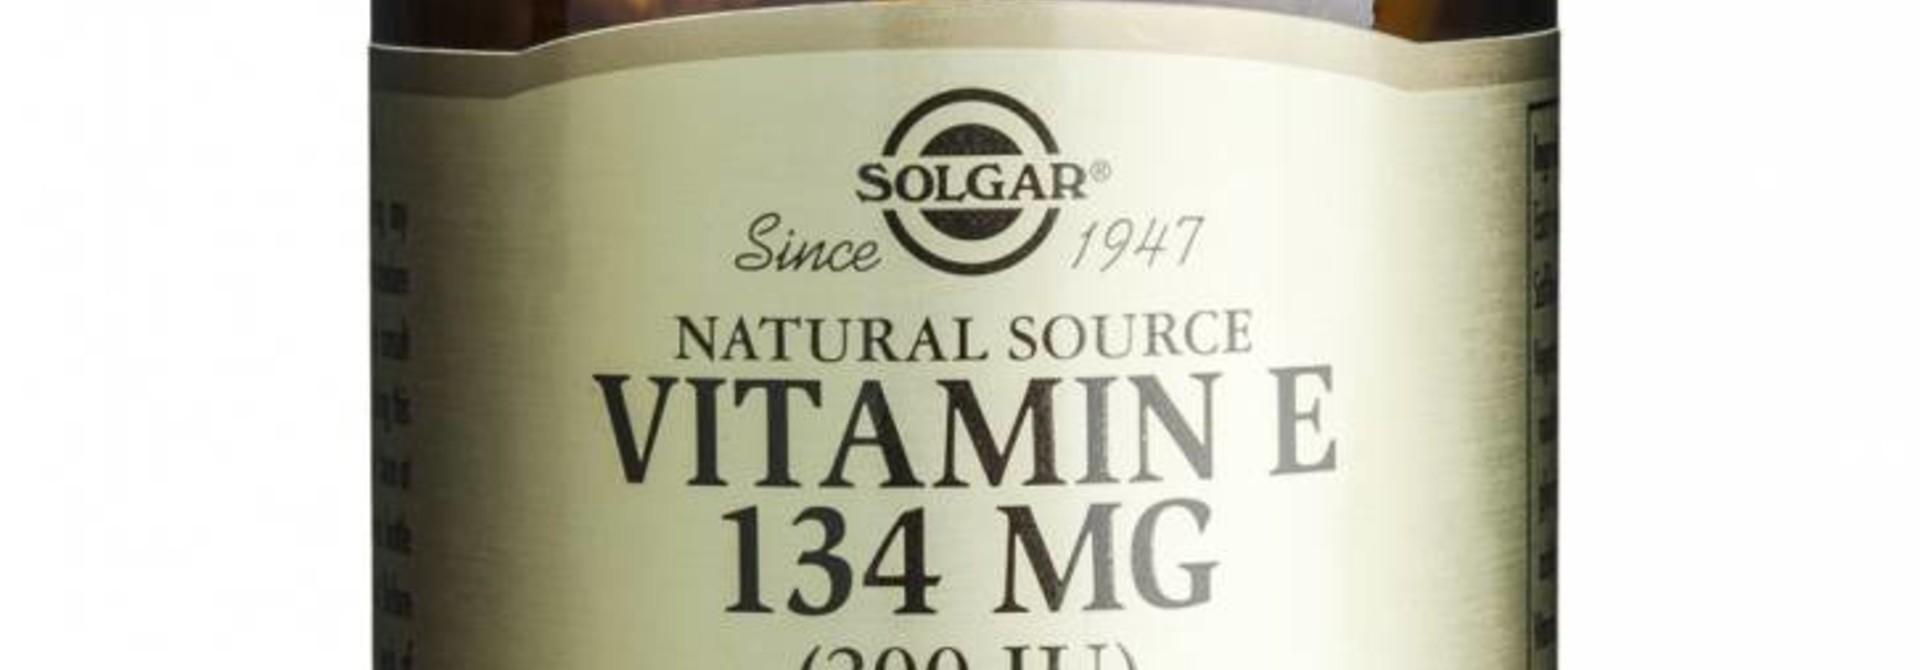 Vitamin E 134 mg/200 IU Vegan 50 plantaardige softgels